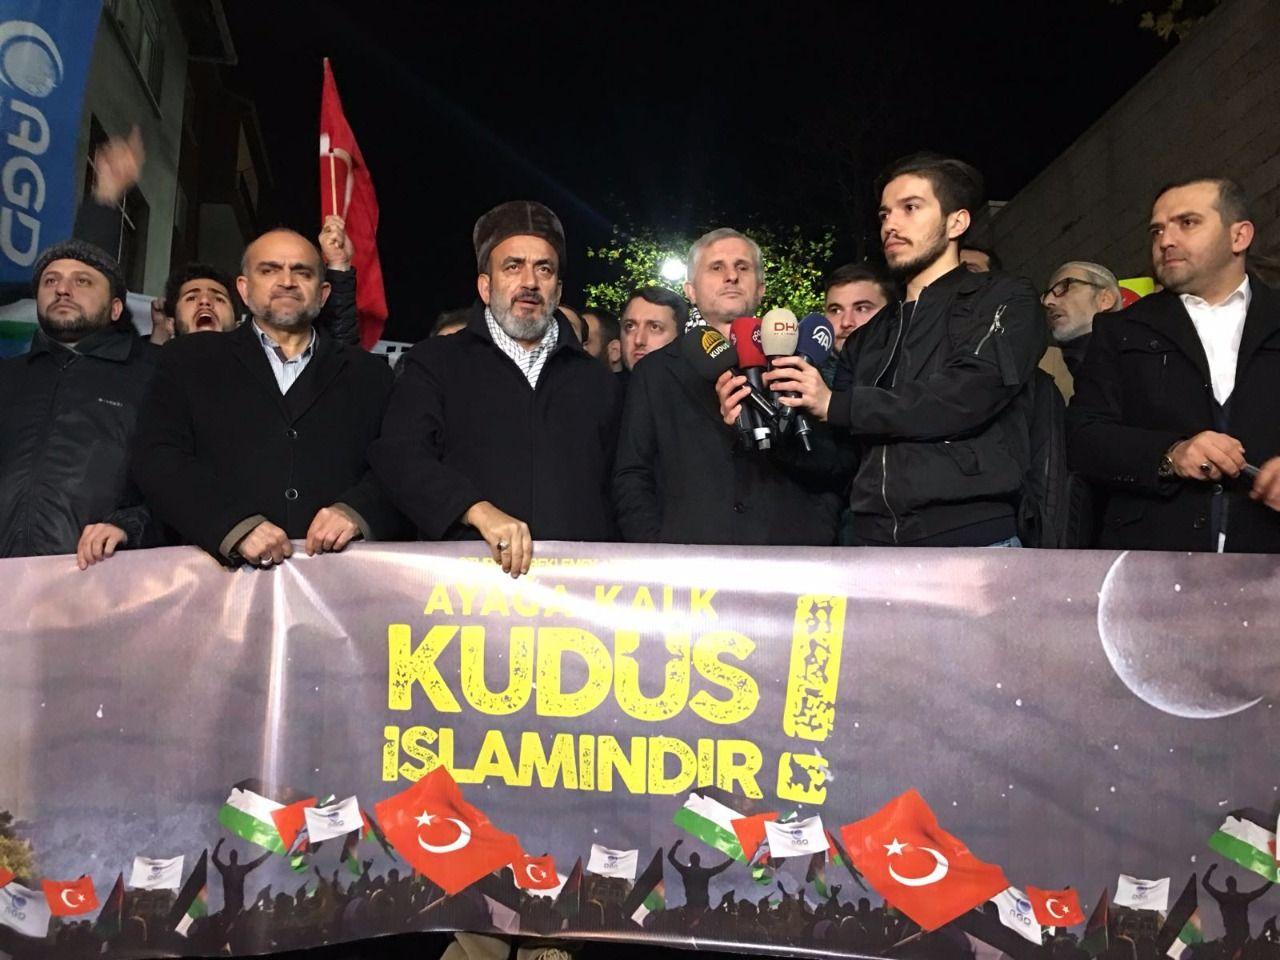 İstanbul AGD Amerika Konsolosluğunu Kuşattı